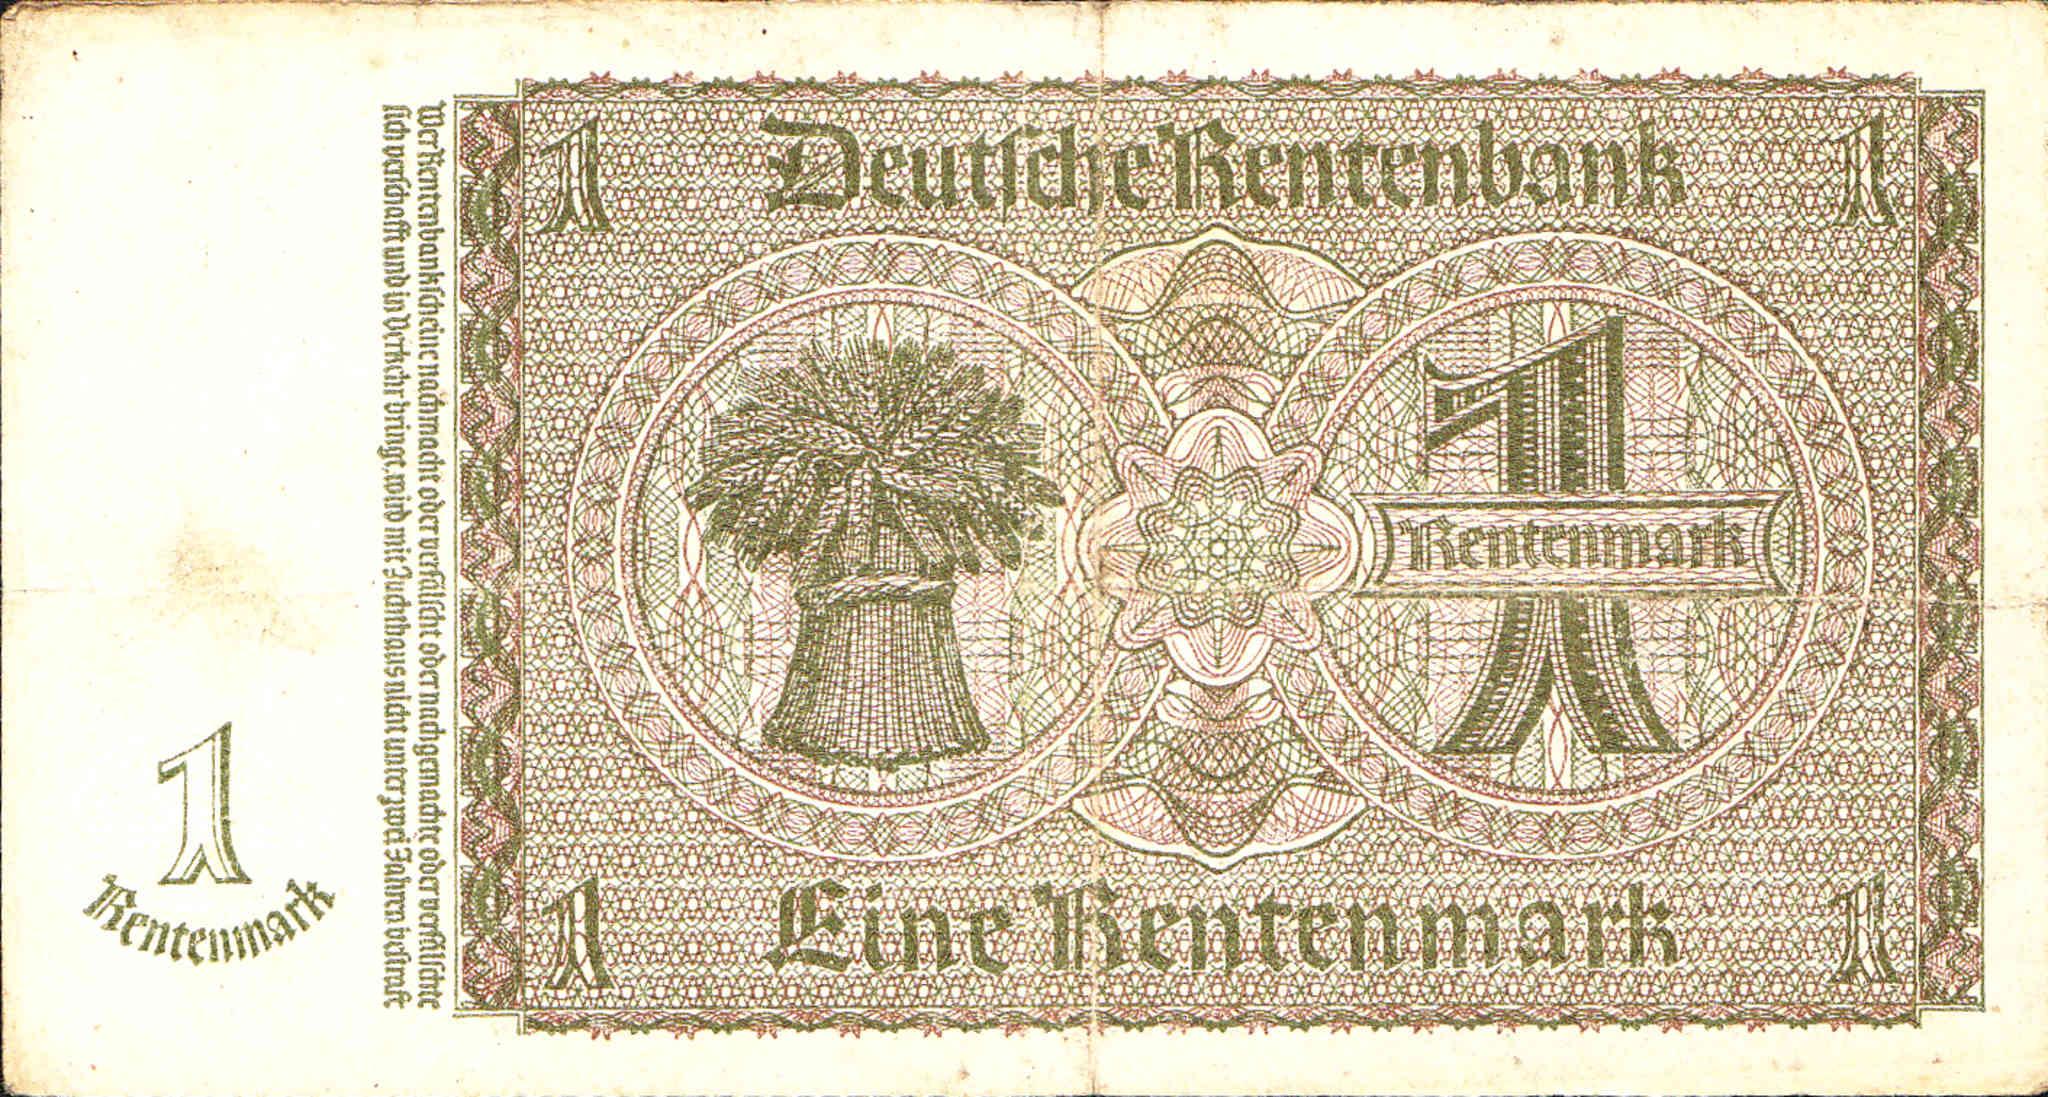 Germany 1 Rentenmark 1937 P-173b Banknotes UNC